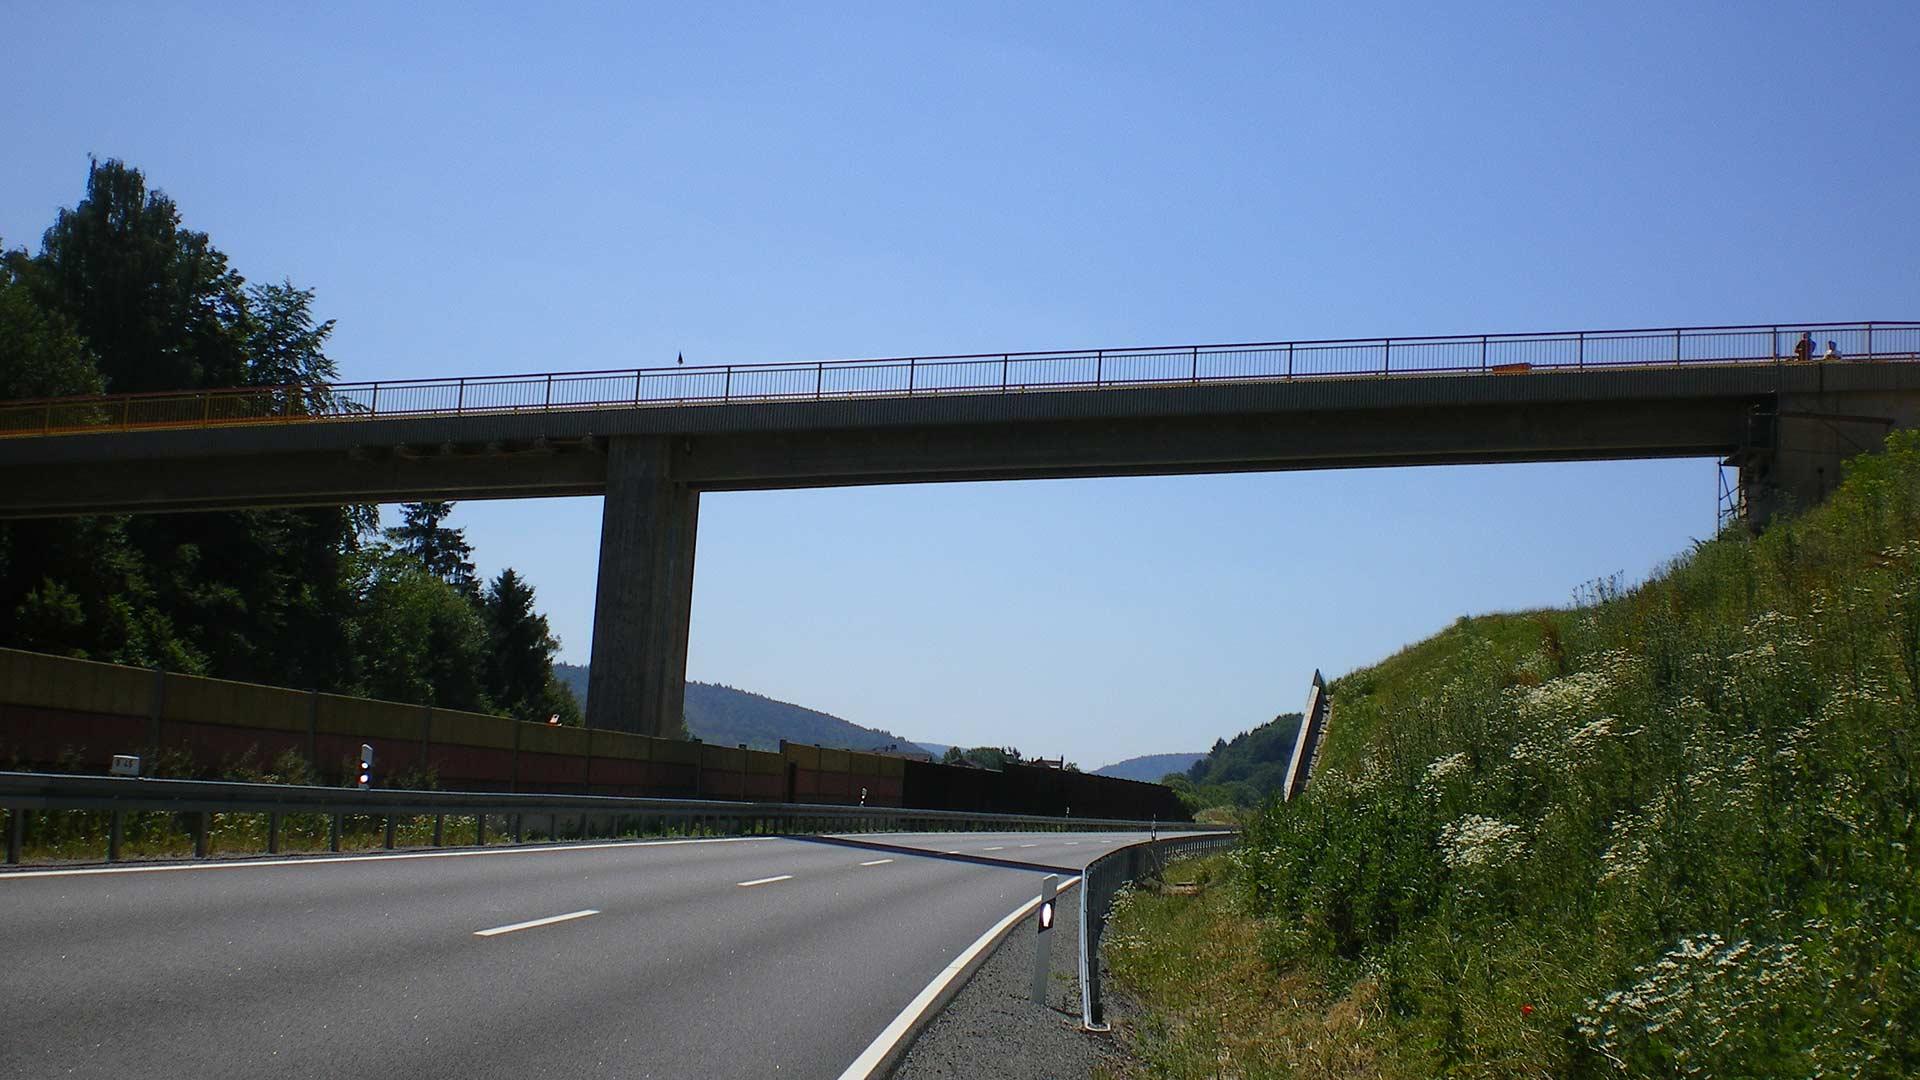 Autobahnbrücke in Hessen